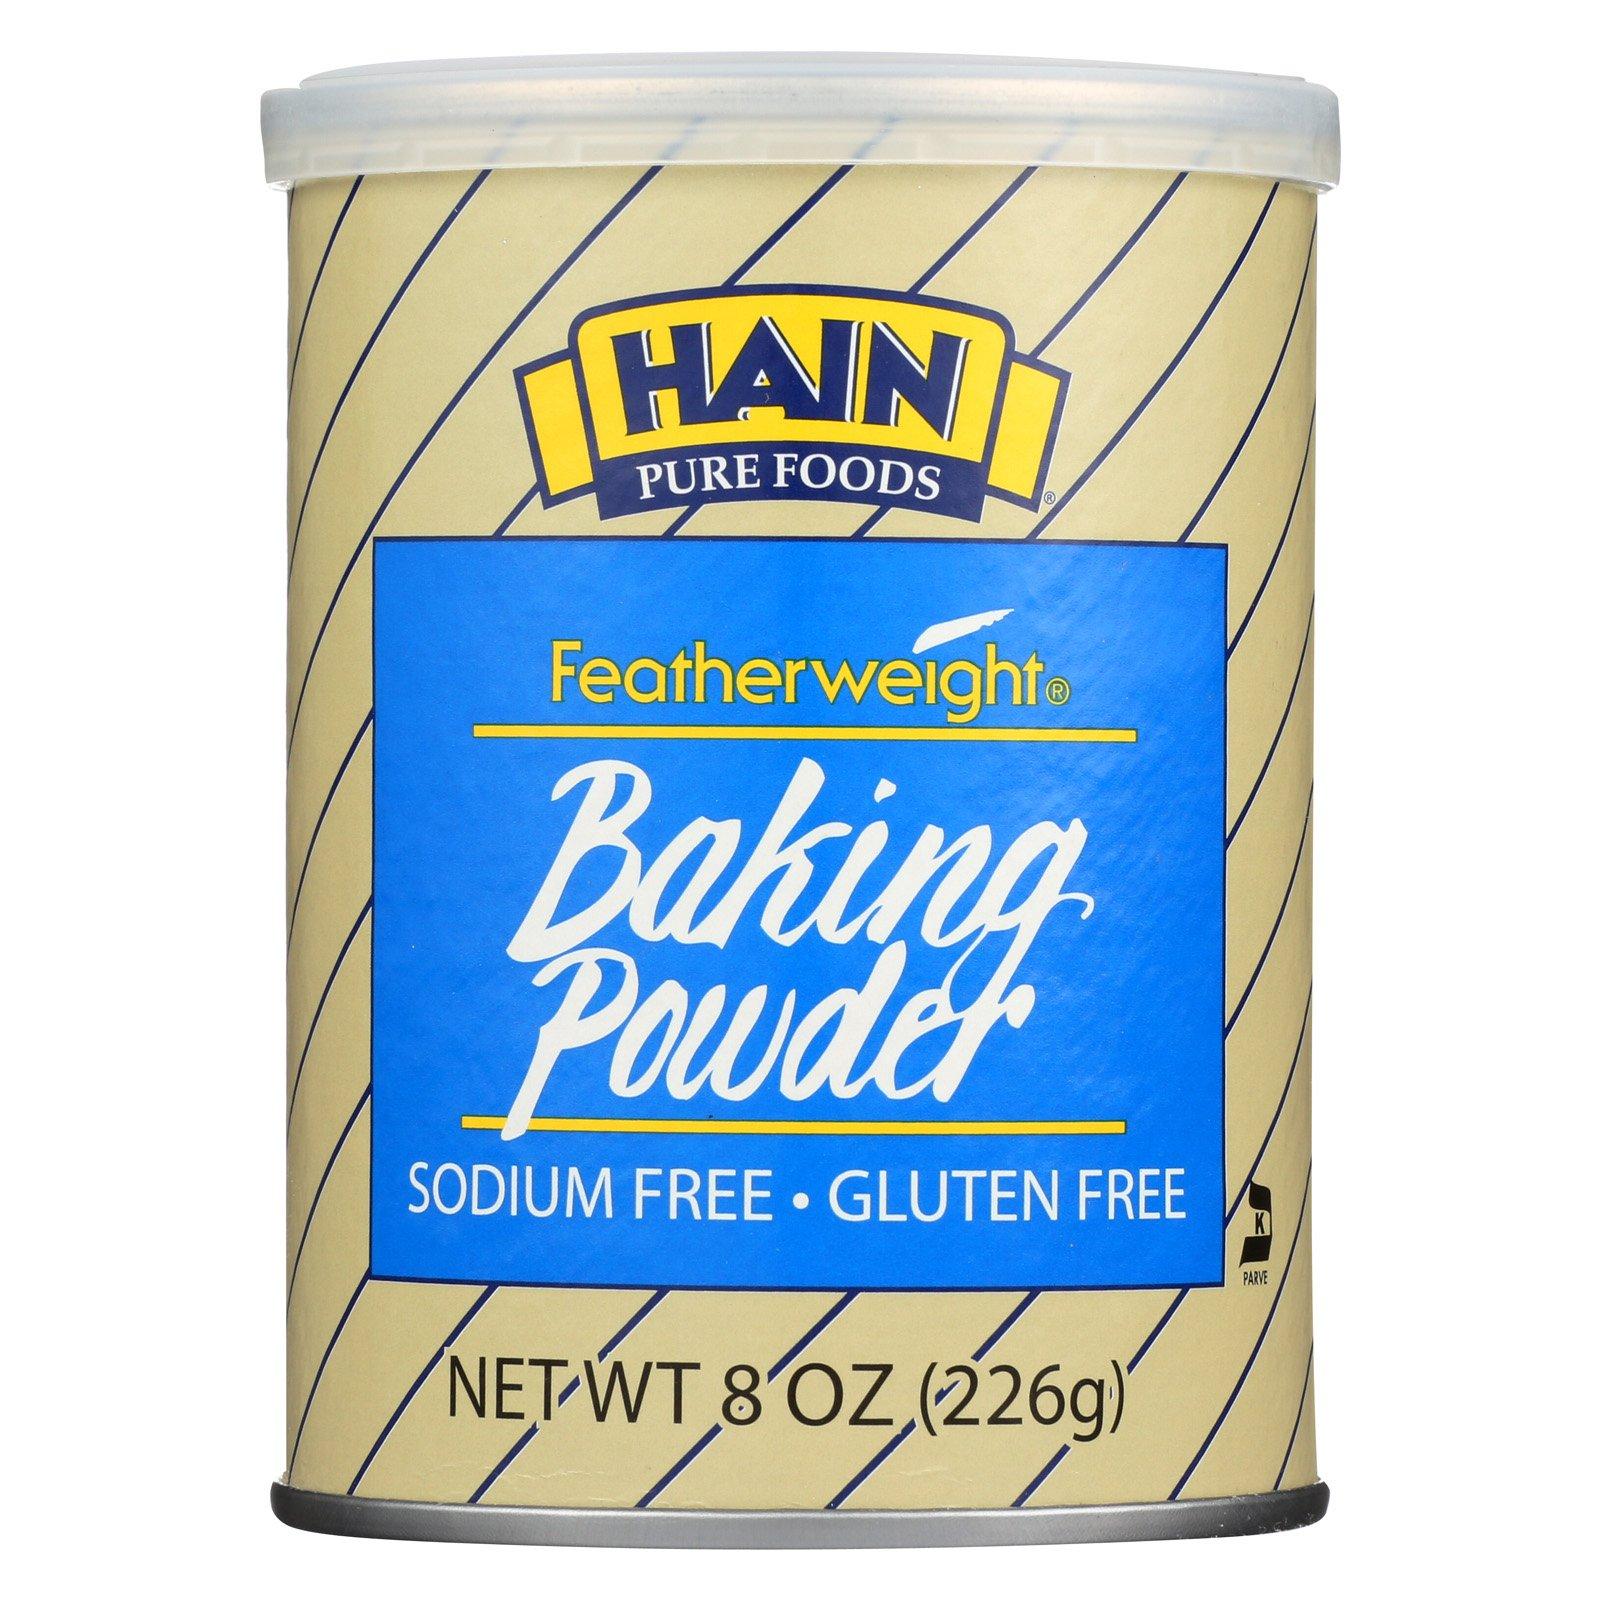 Hain Baking Powder - Featherweight - Case of 12 - 8 oz.